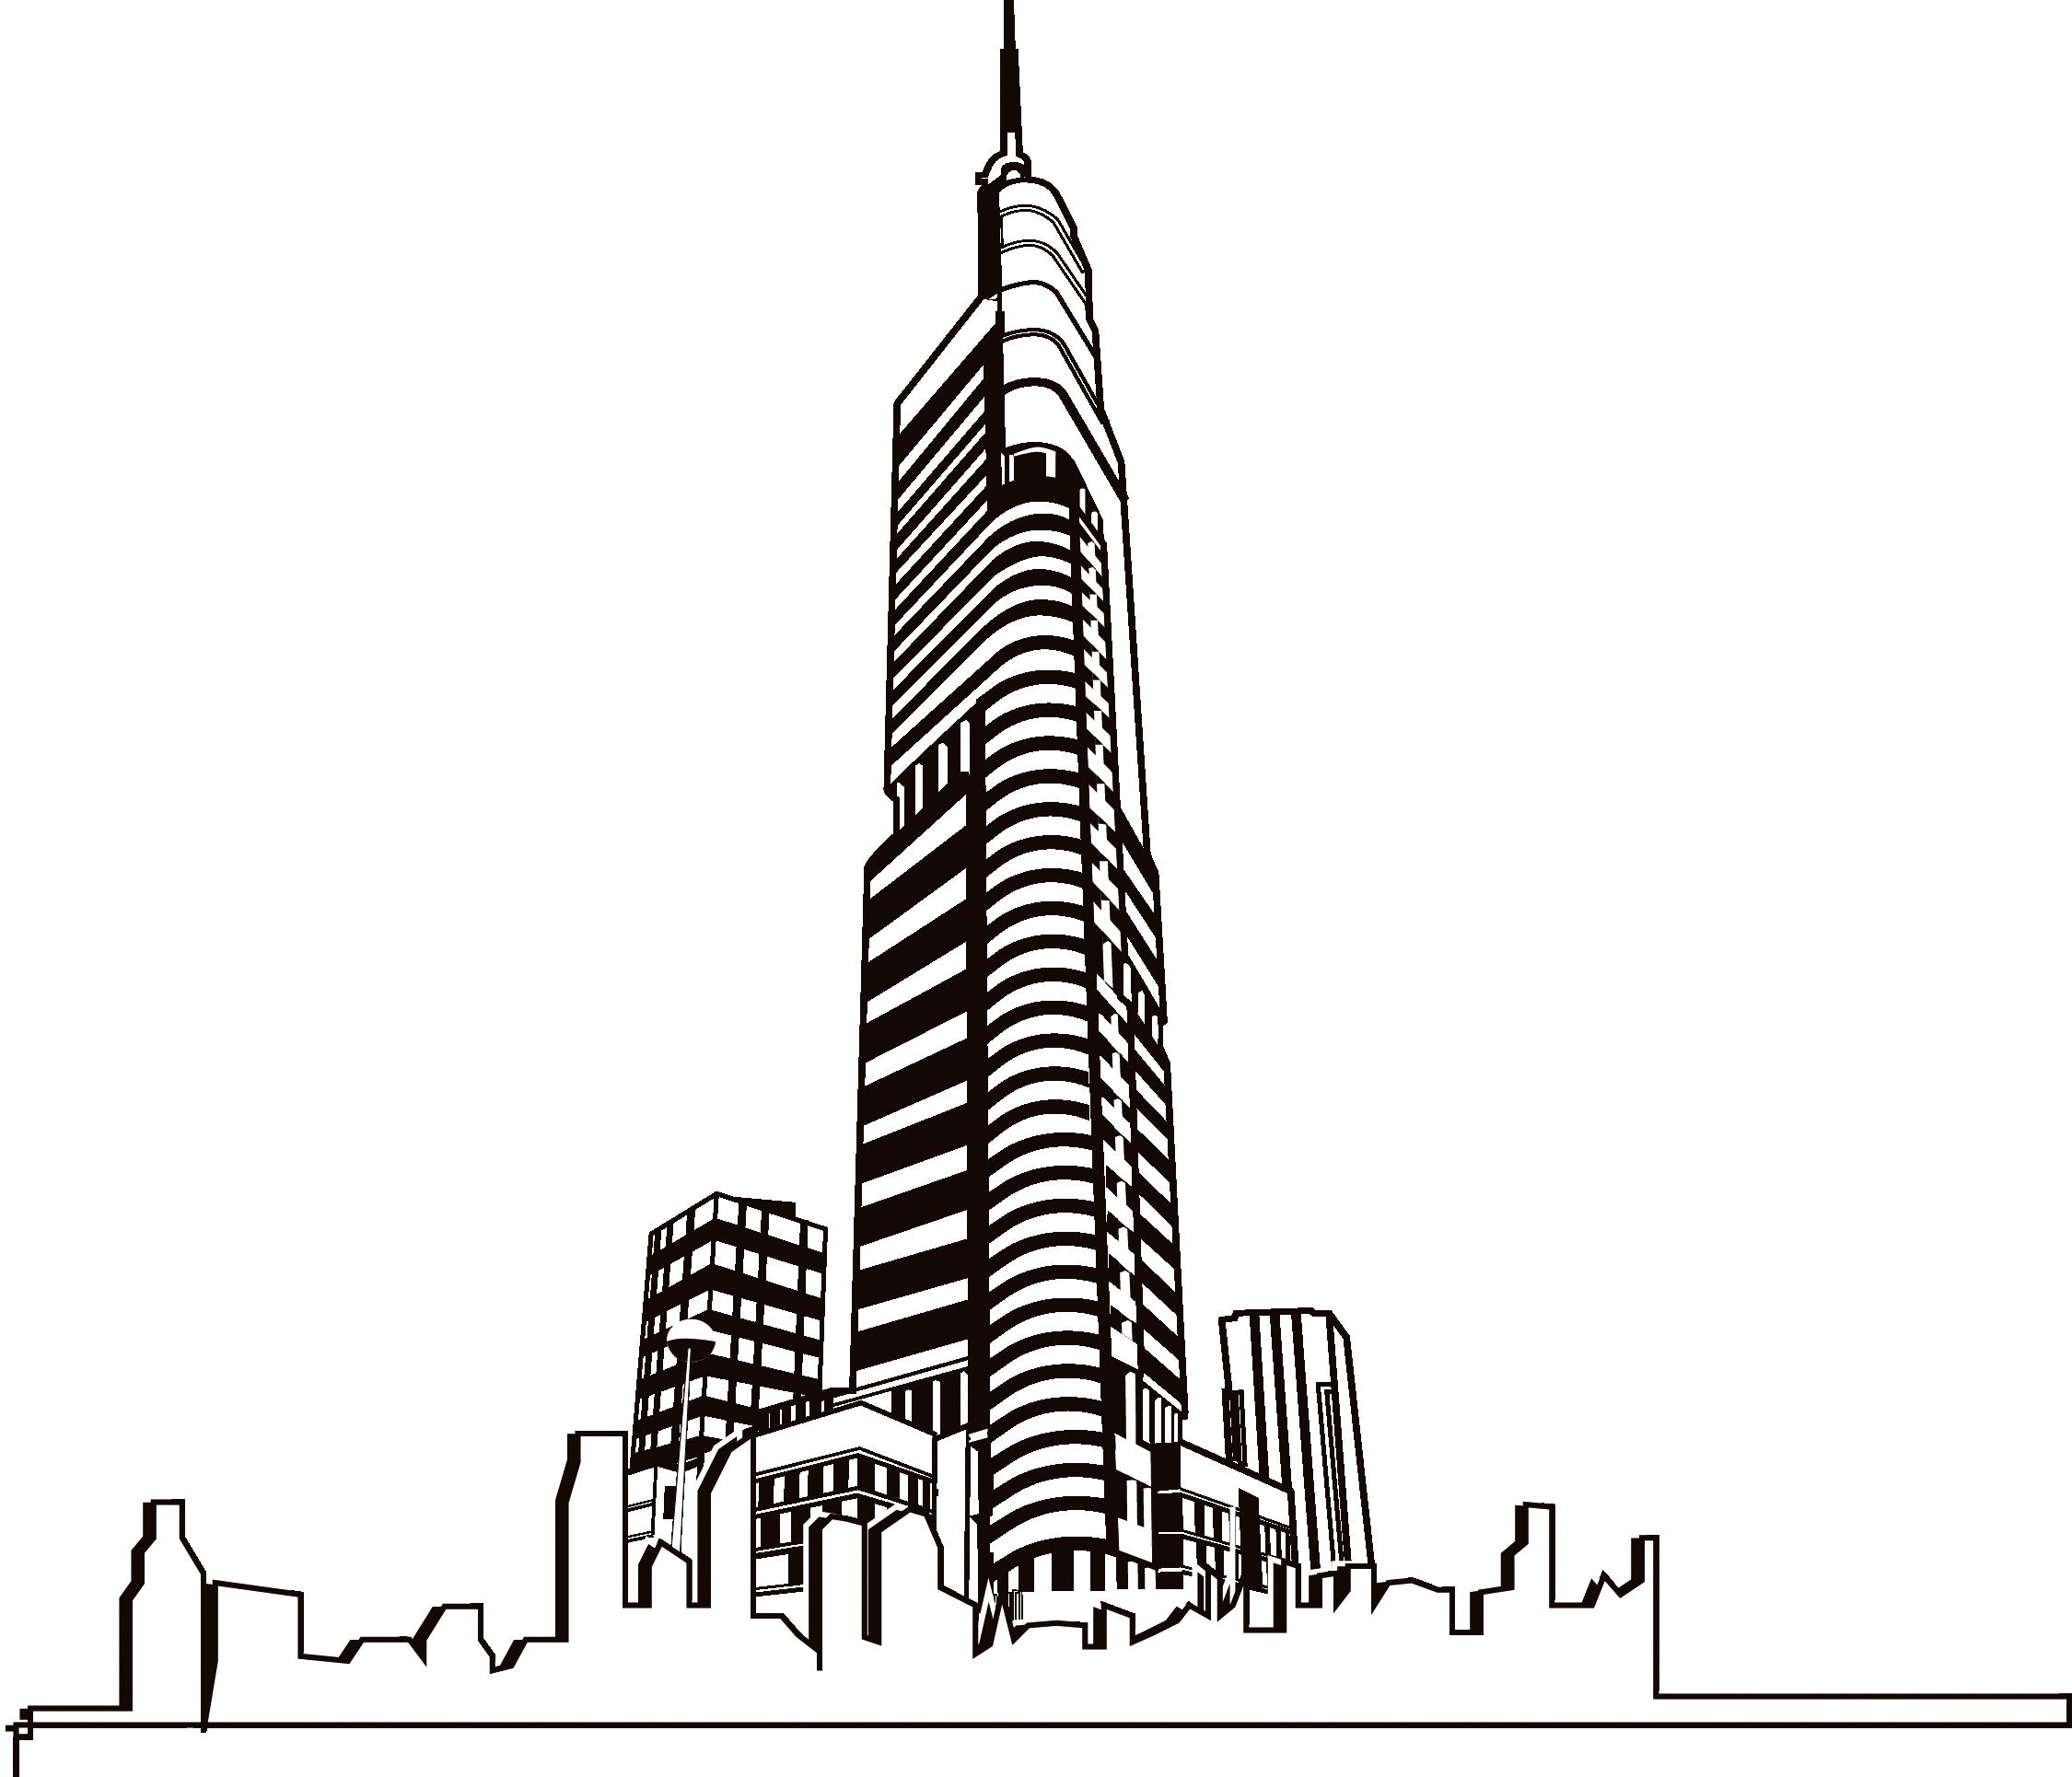 Skyscrapercity building clip art. City clipart metropolitan area